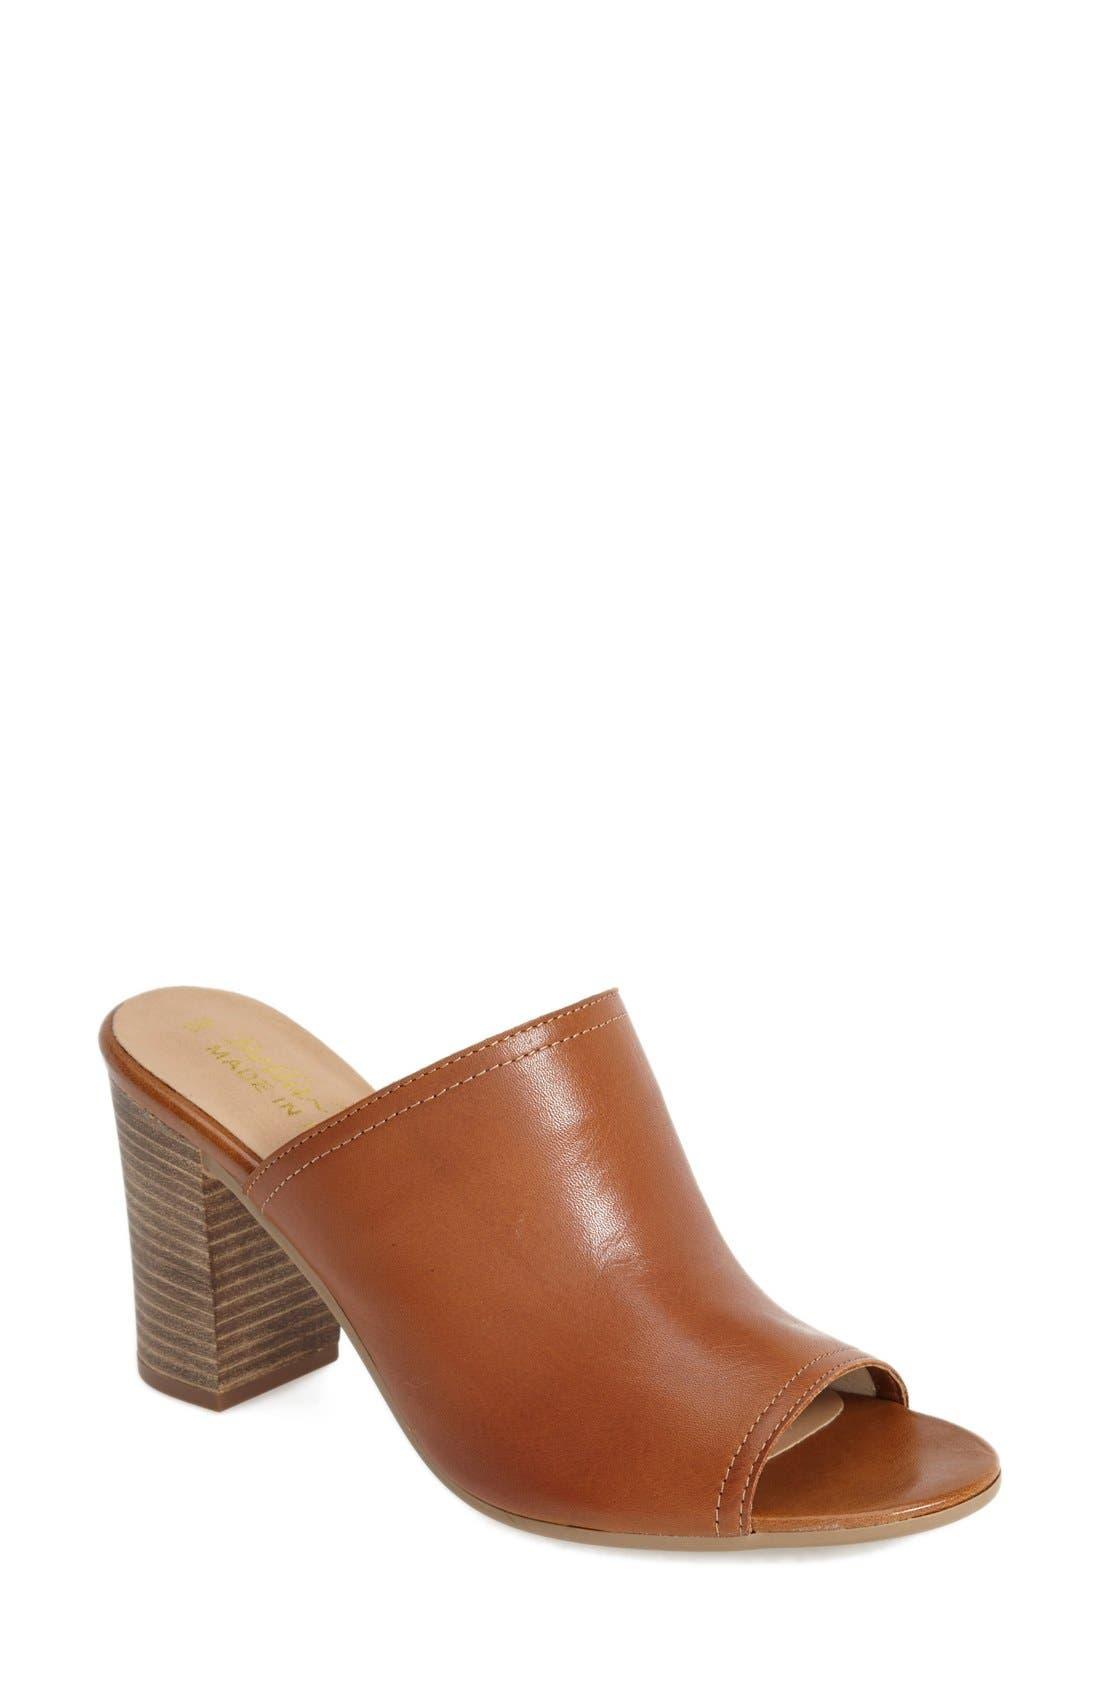 'Arno' Leather Mule,                         Main,                         color, Tan